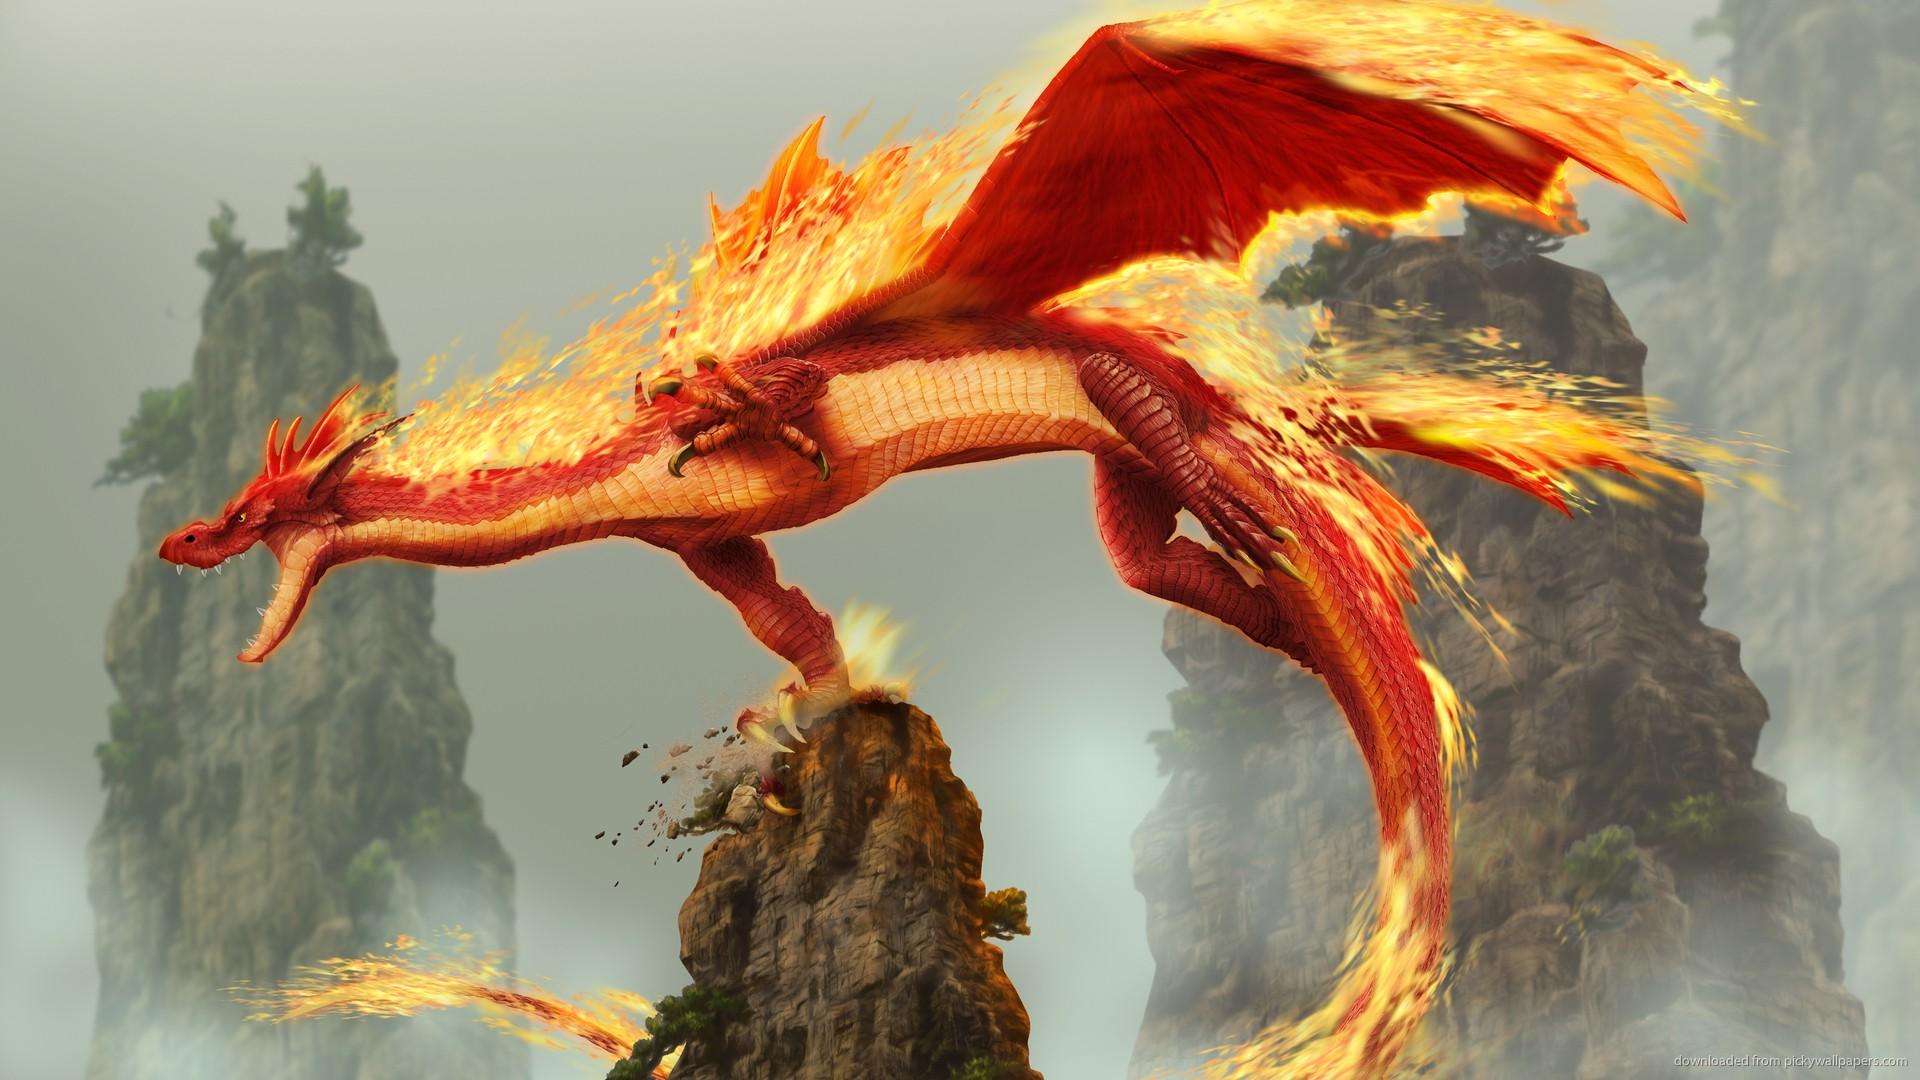 1920x1080 Dragon Wallpaper Fire Fantasy Download Girl